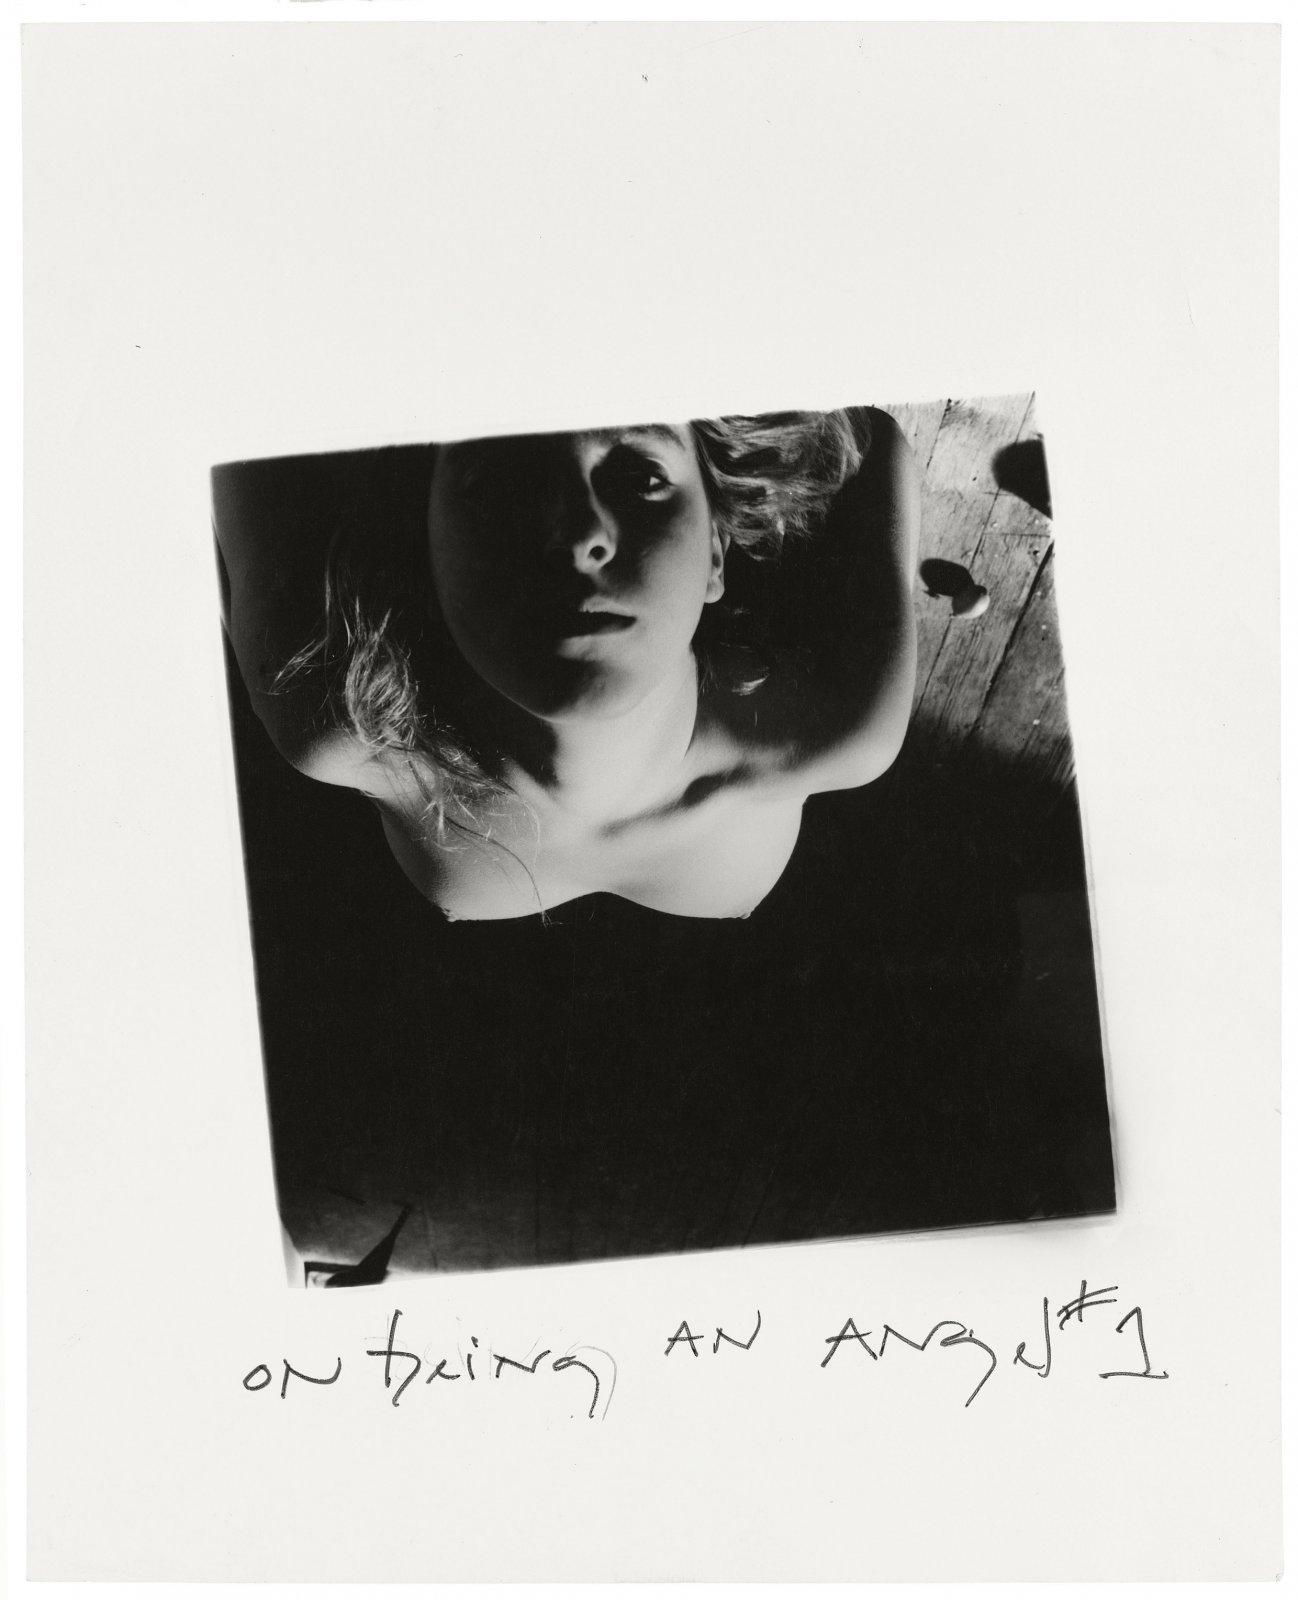 Francesca Woodman, On Being an Angel # 1, Providence, Rhode Island, 1977 © George and Betty Woodman